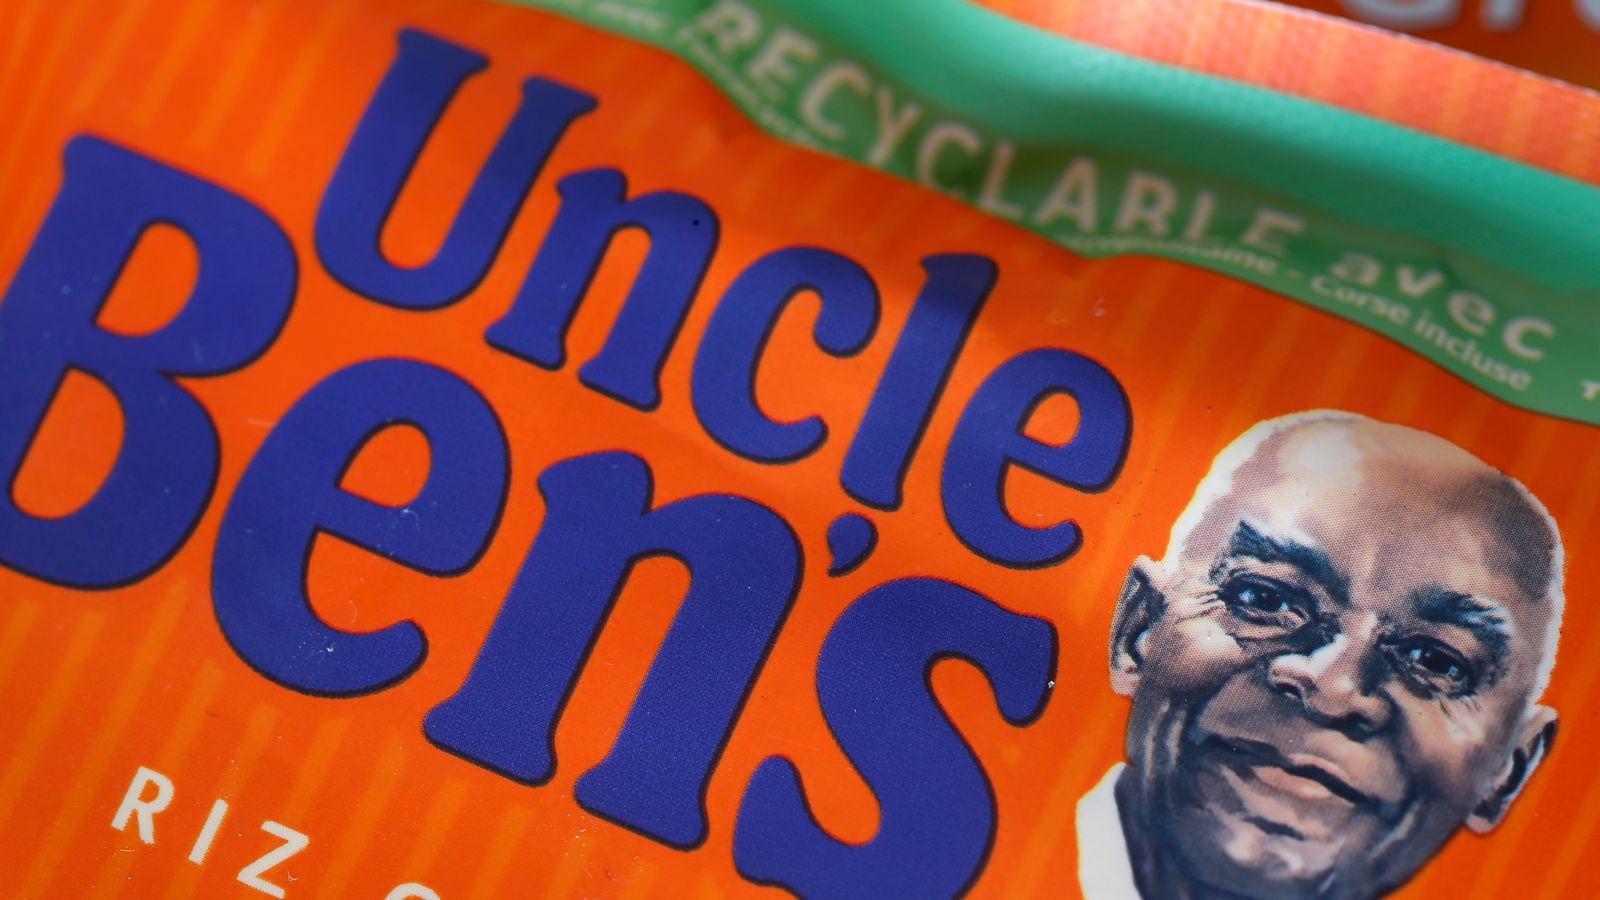 skynews uncle bens bens original 5105536 jpg?20200923104759